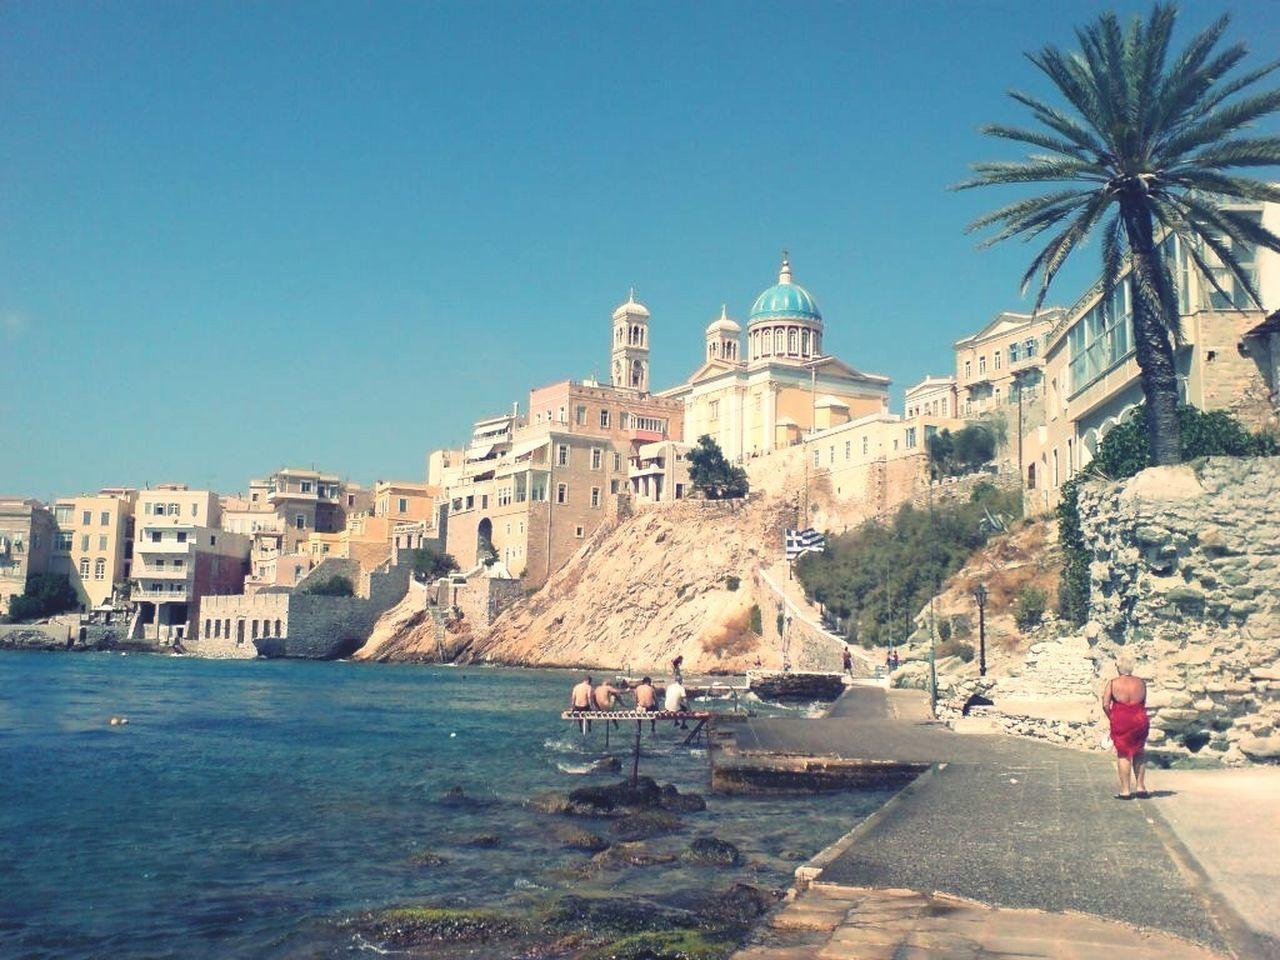 Greek Islands The Great Outdoors - 2015 EyeEm Awards